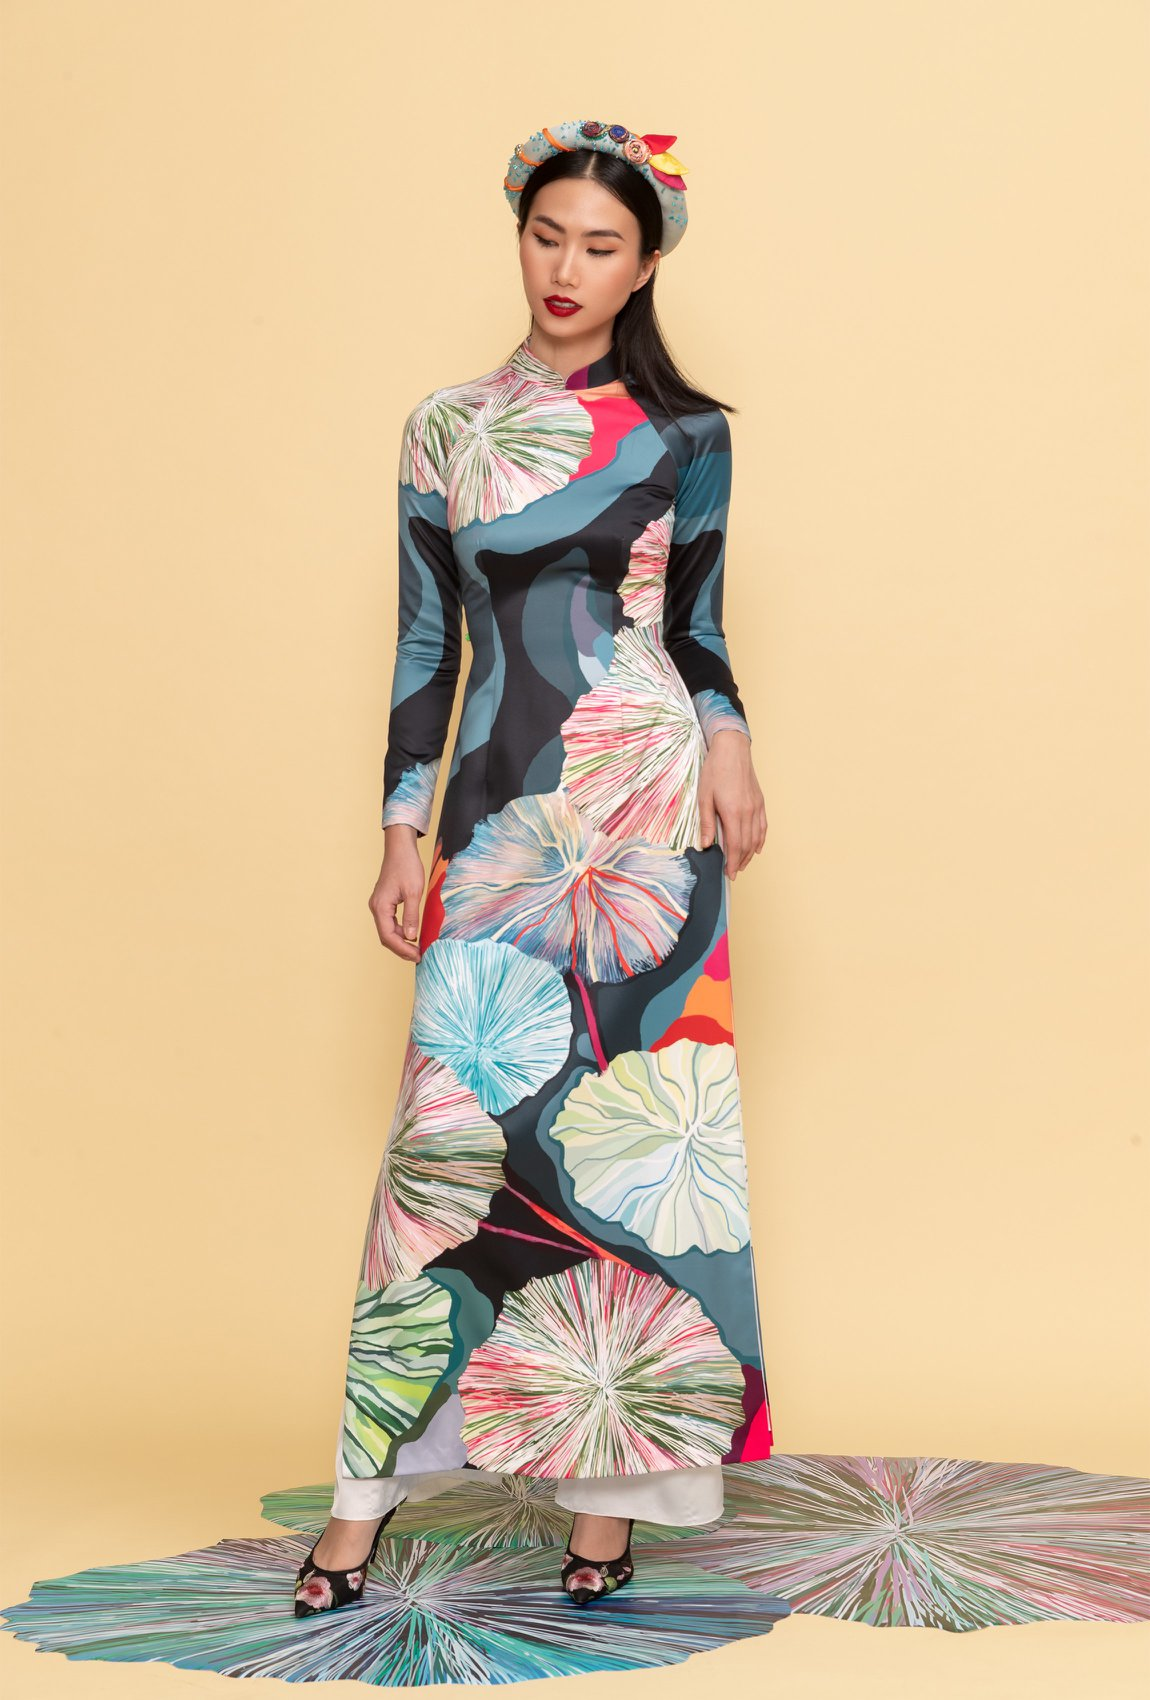 áo dài tết 2020 thủy design house